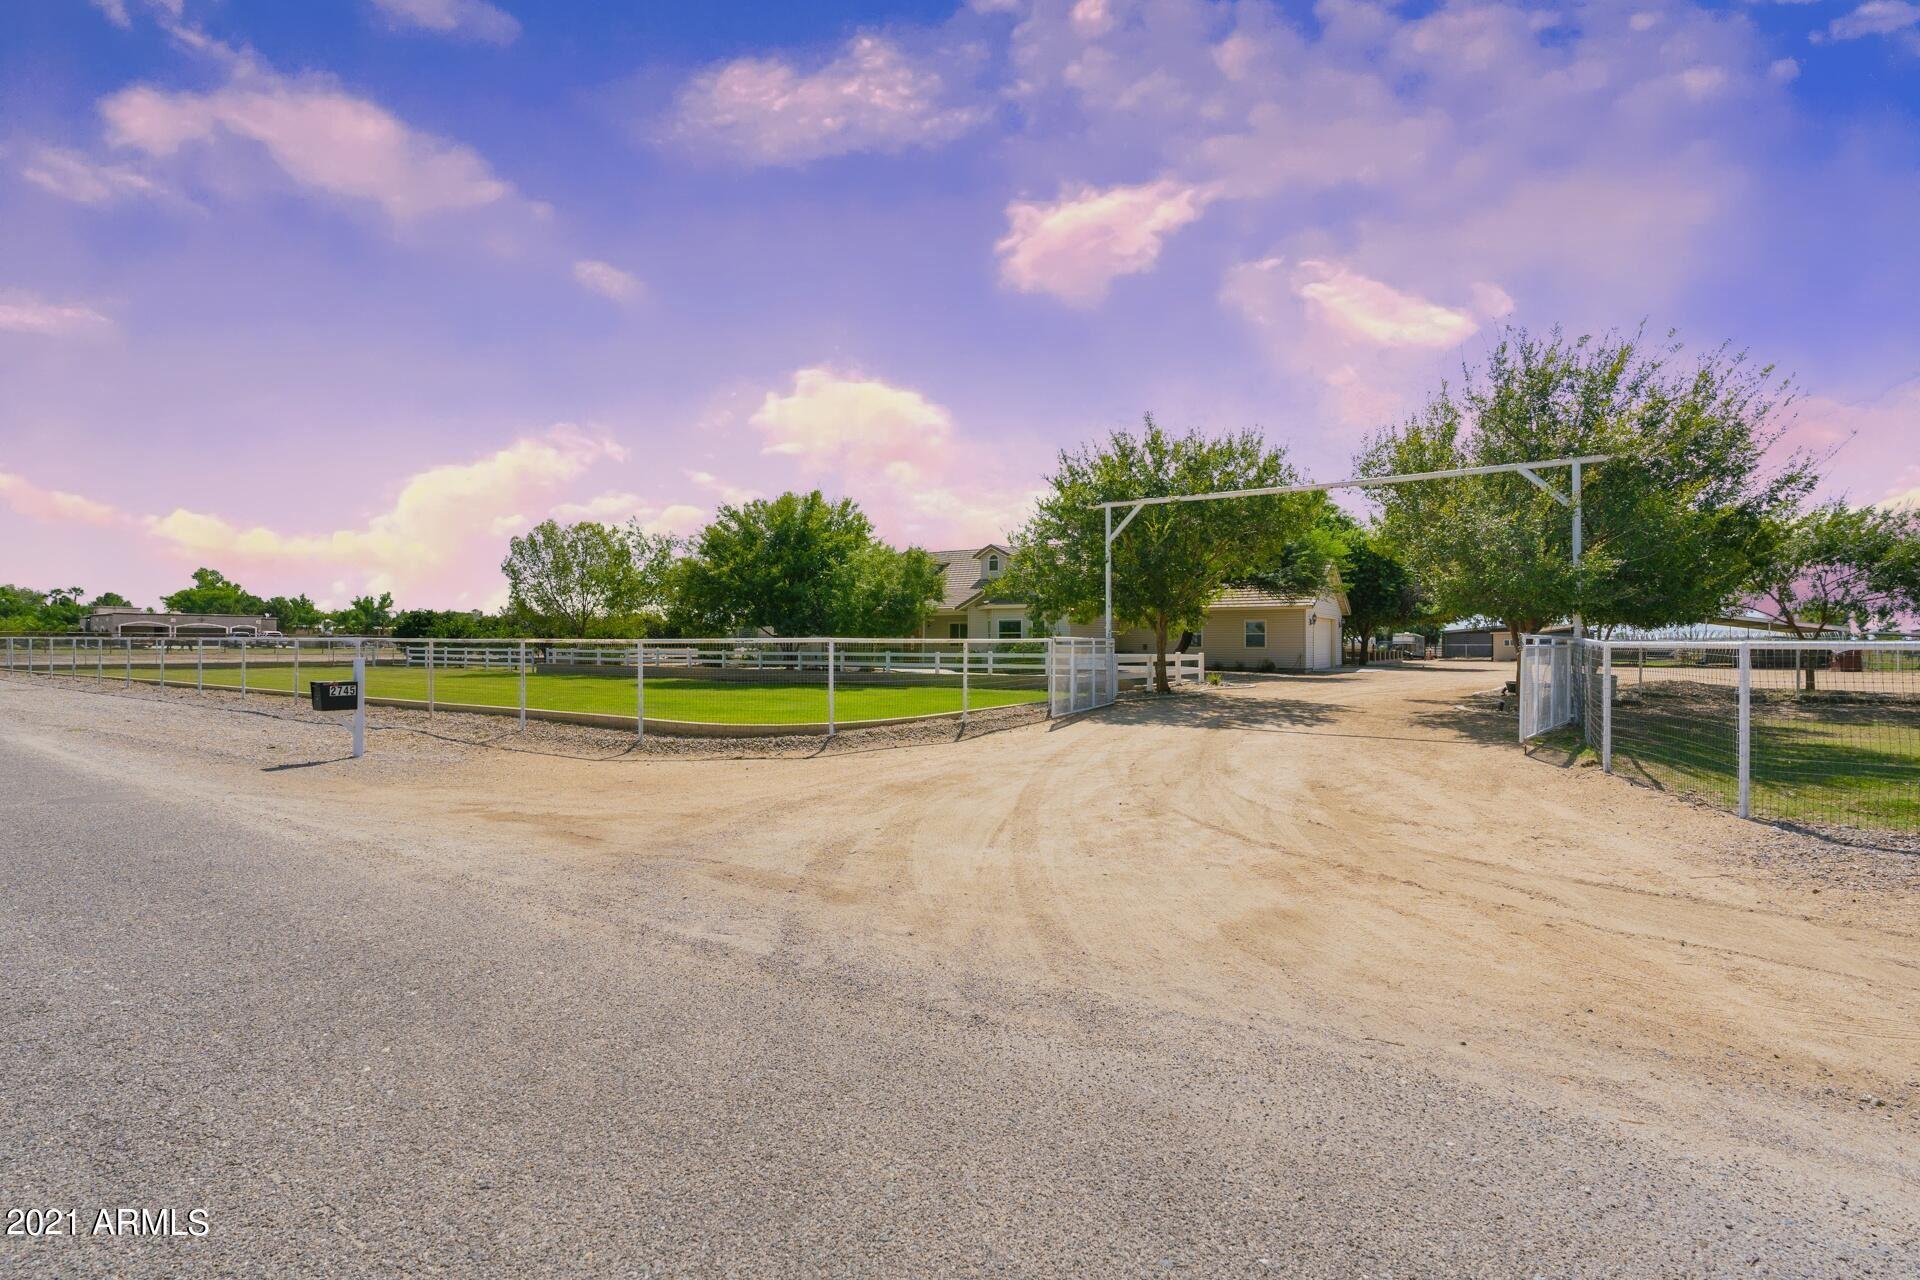 Photo of 2745 E SOUTHWOOD Road, San Tan Valley, AZ 85140 (MLS # 6296530)